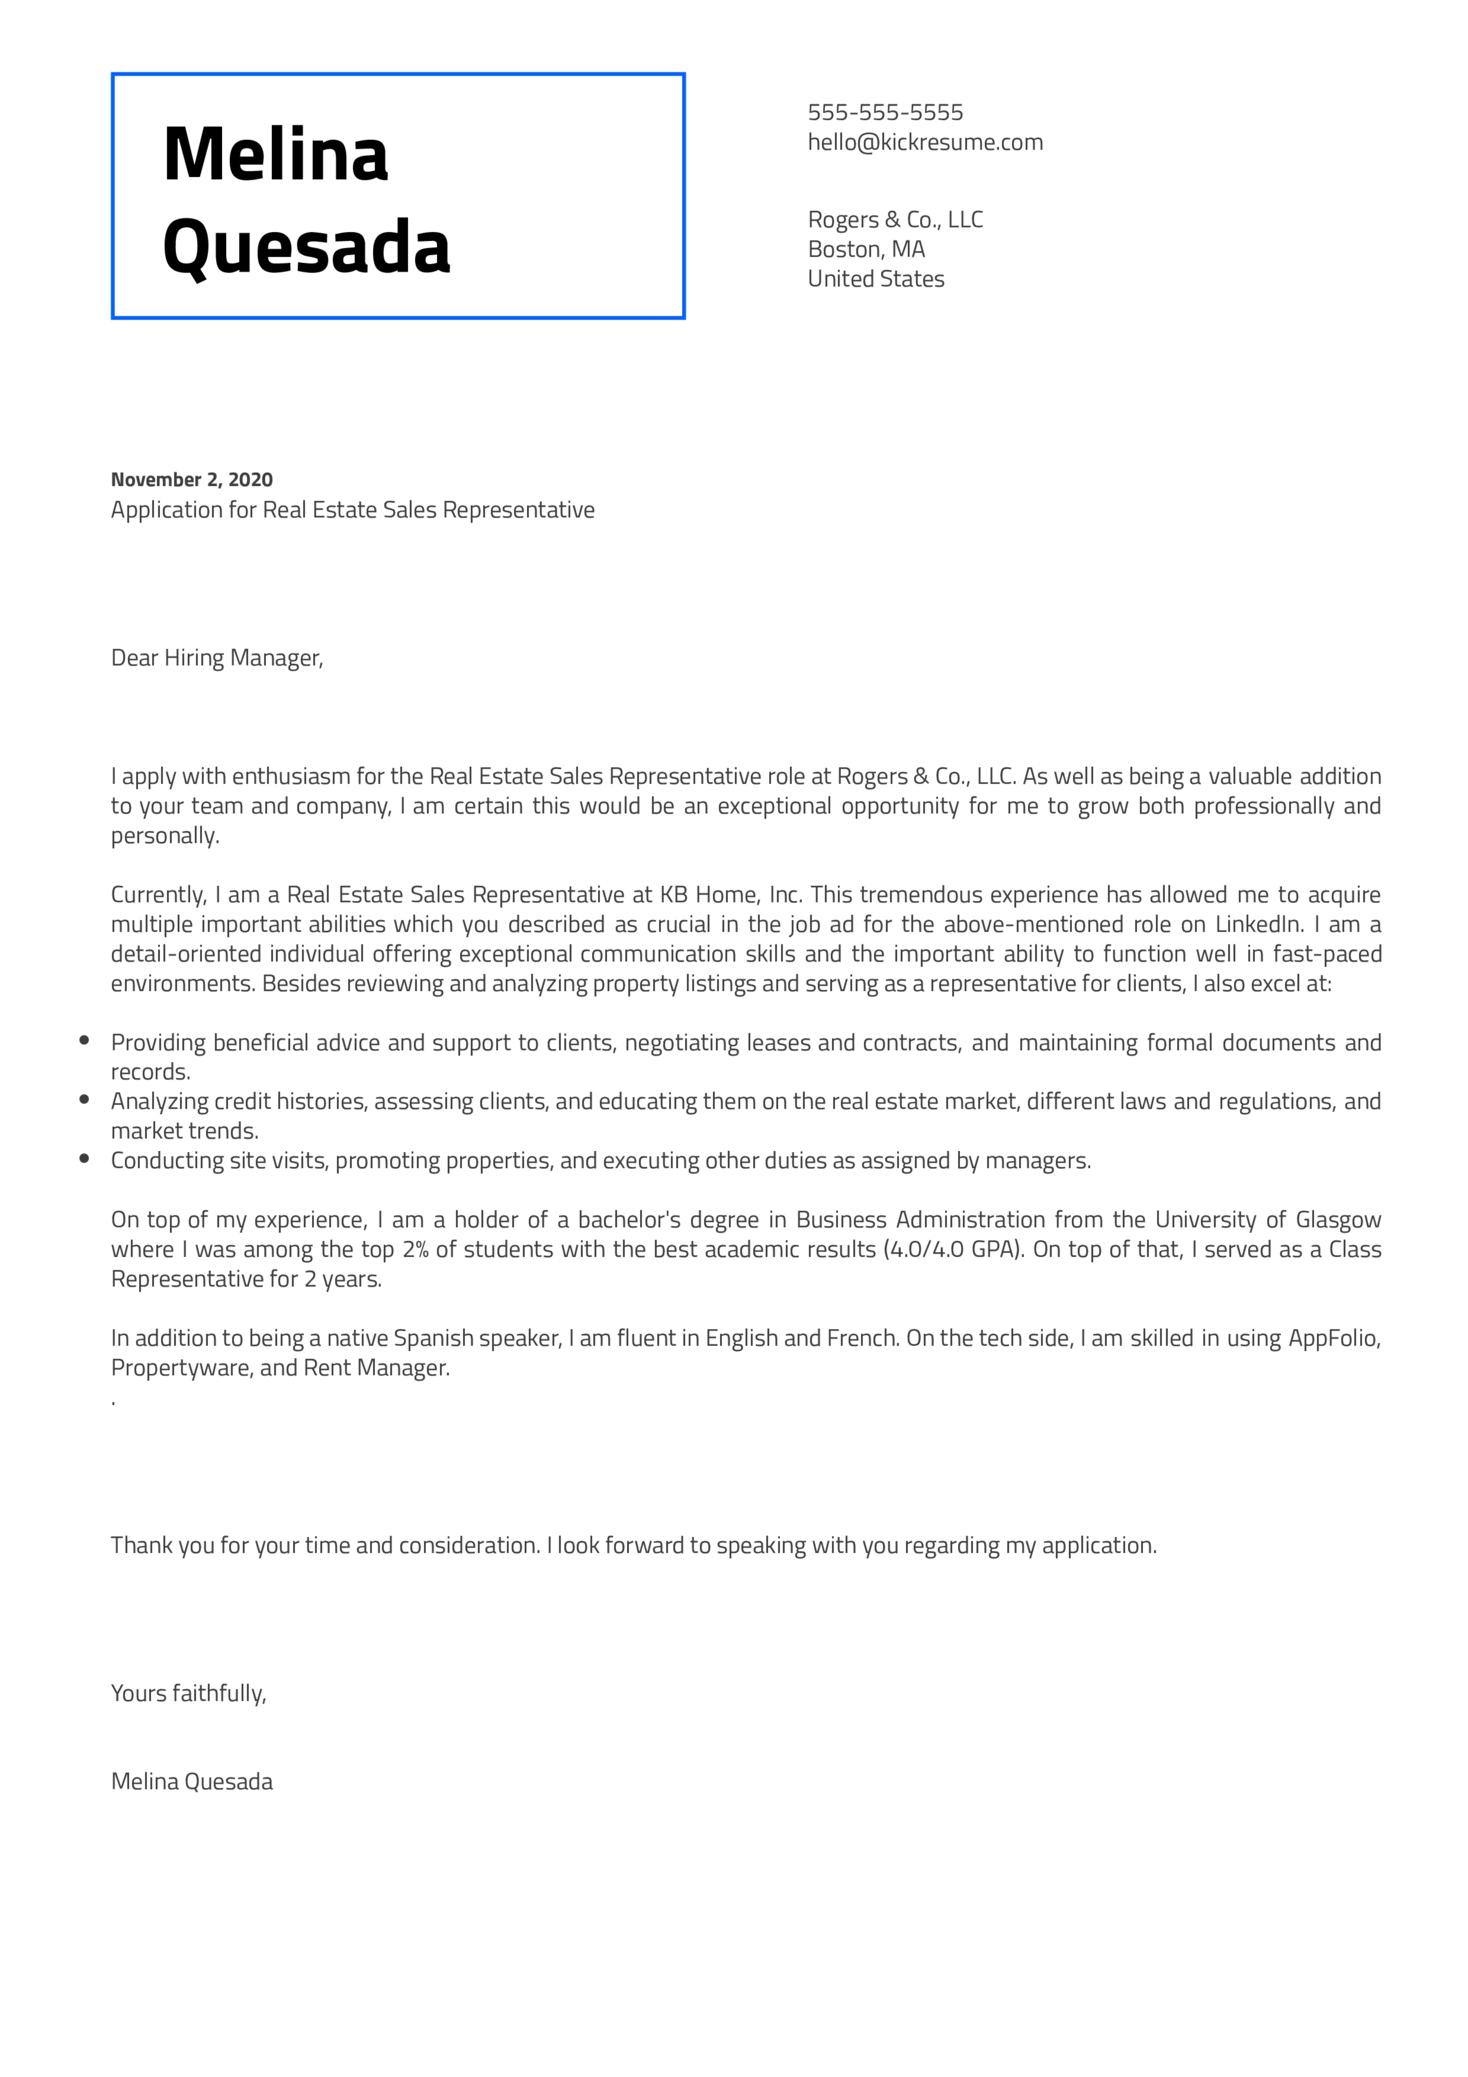 Real Estate Sales Representative Cover Letter Sample